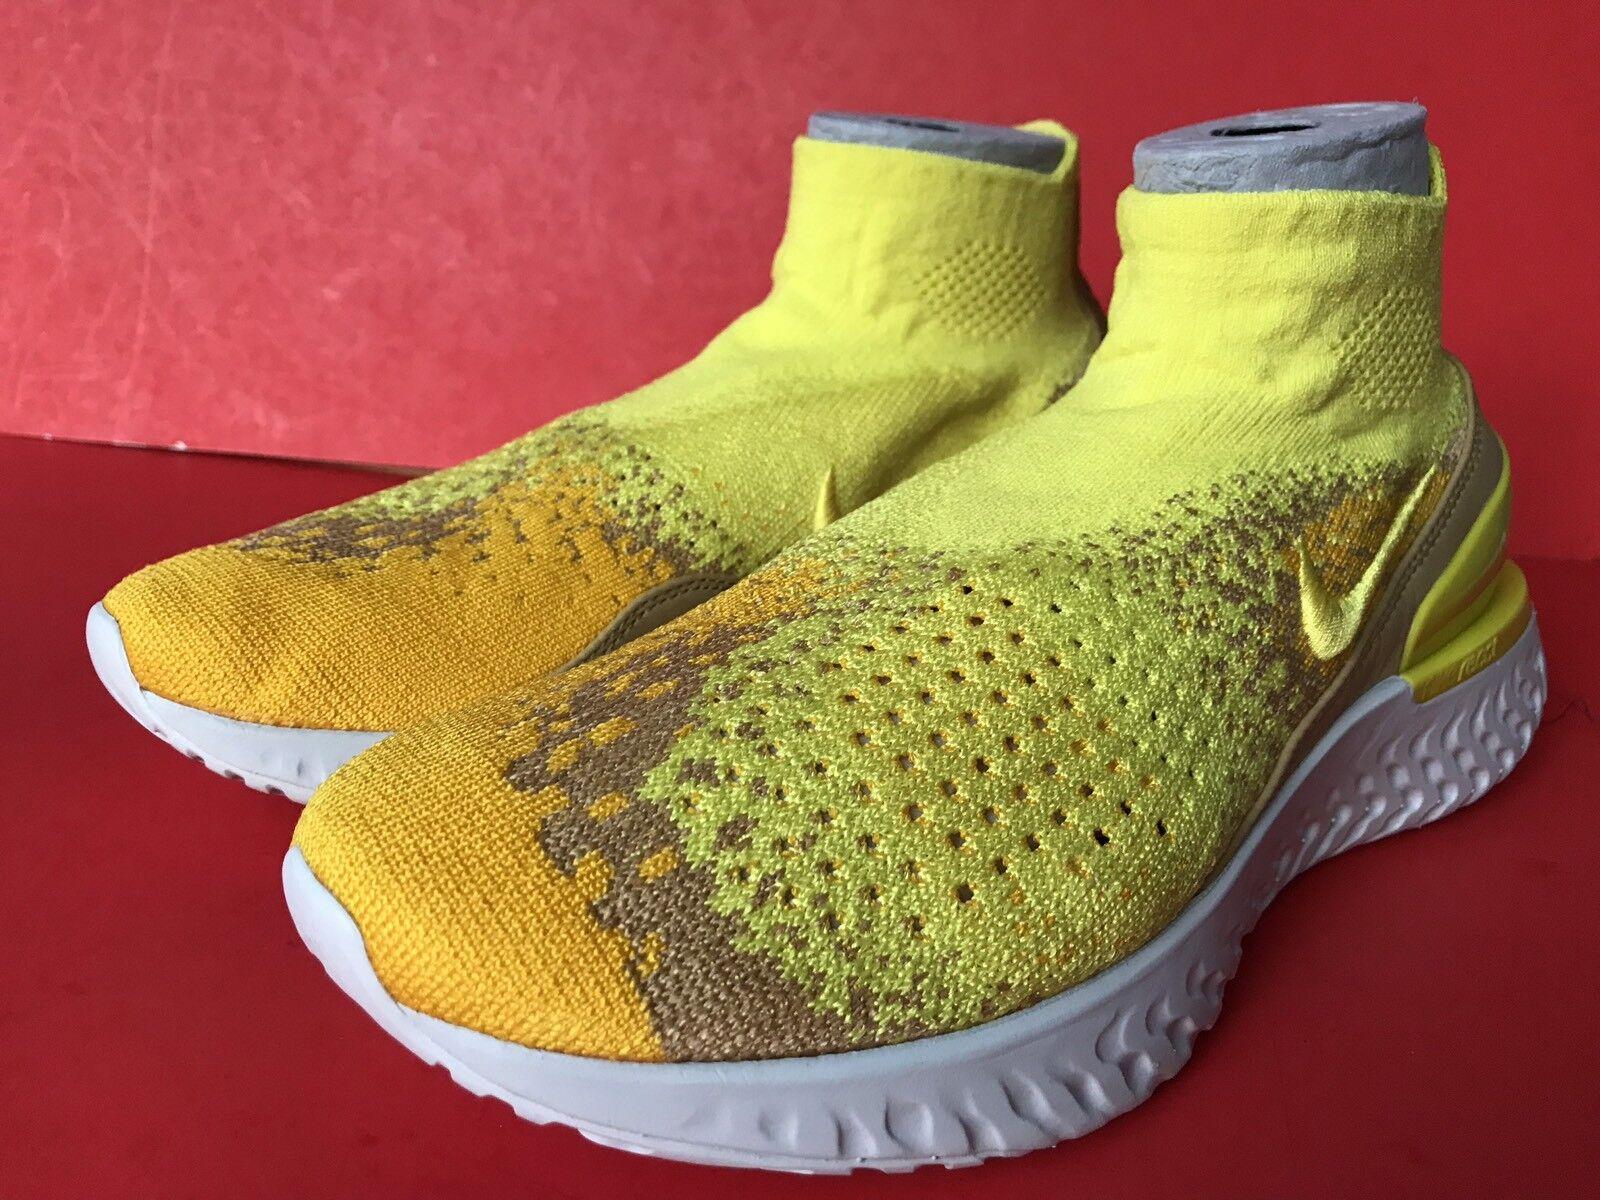 Nike Rise React Flyknit Limited BQ6176 707 707 707 Größe 13  Men 950877